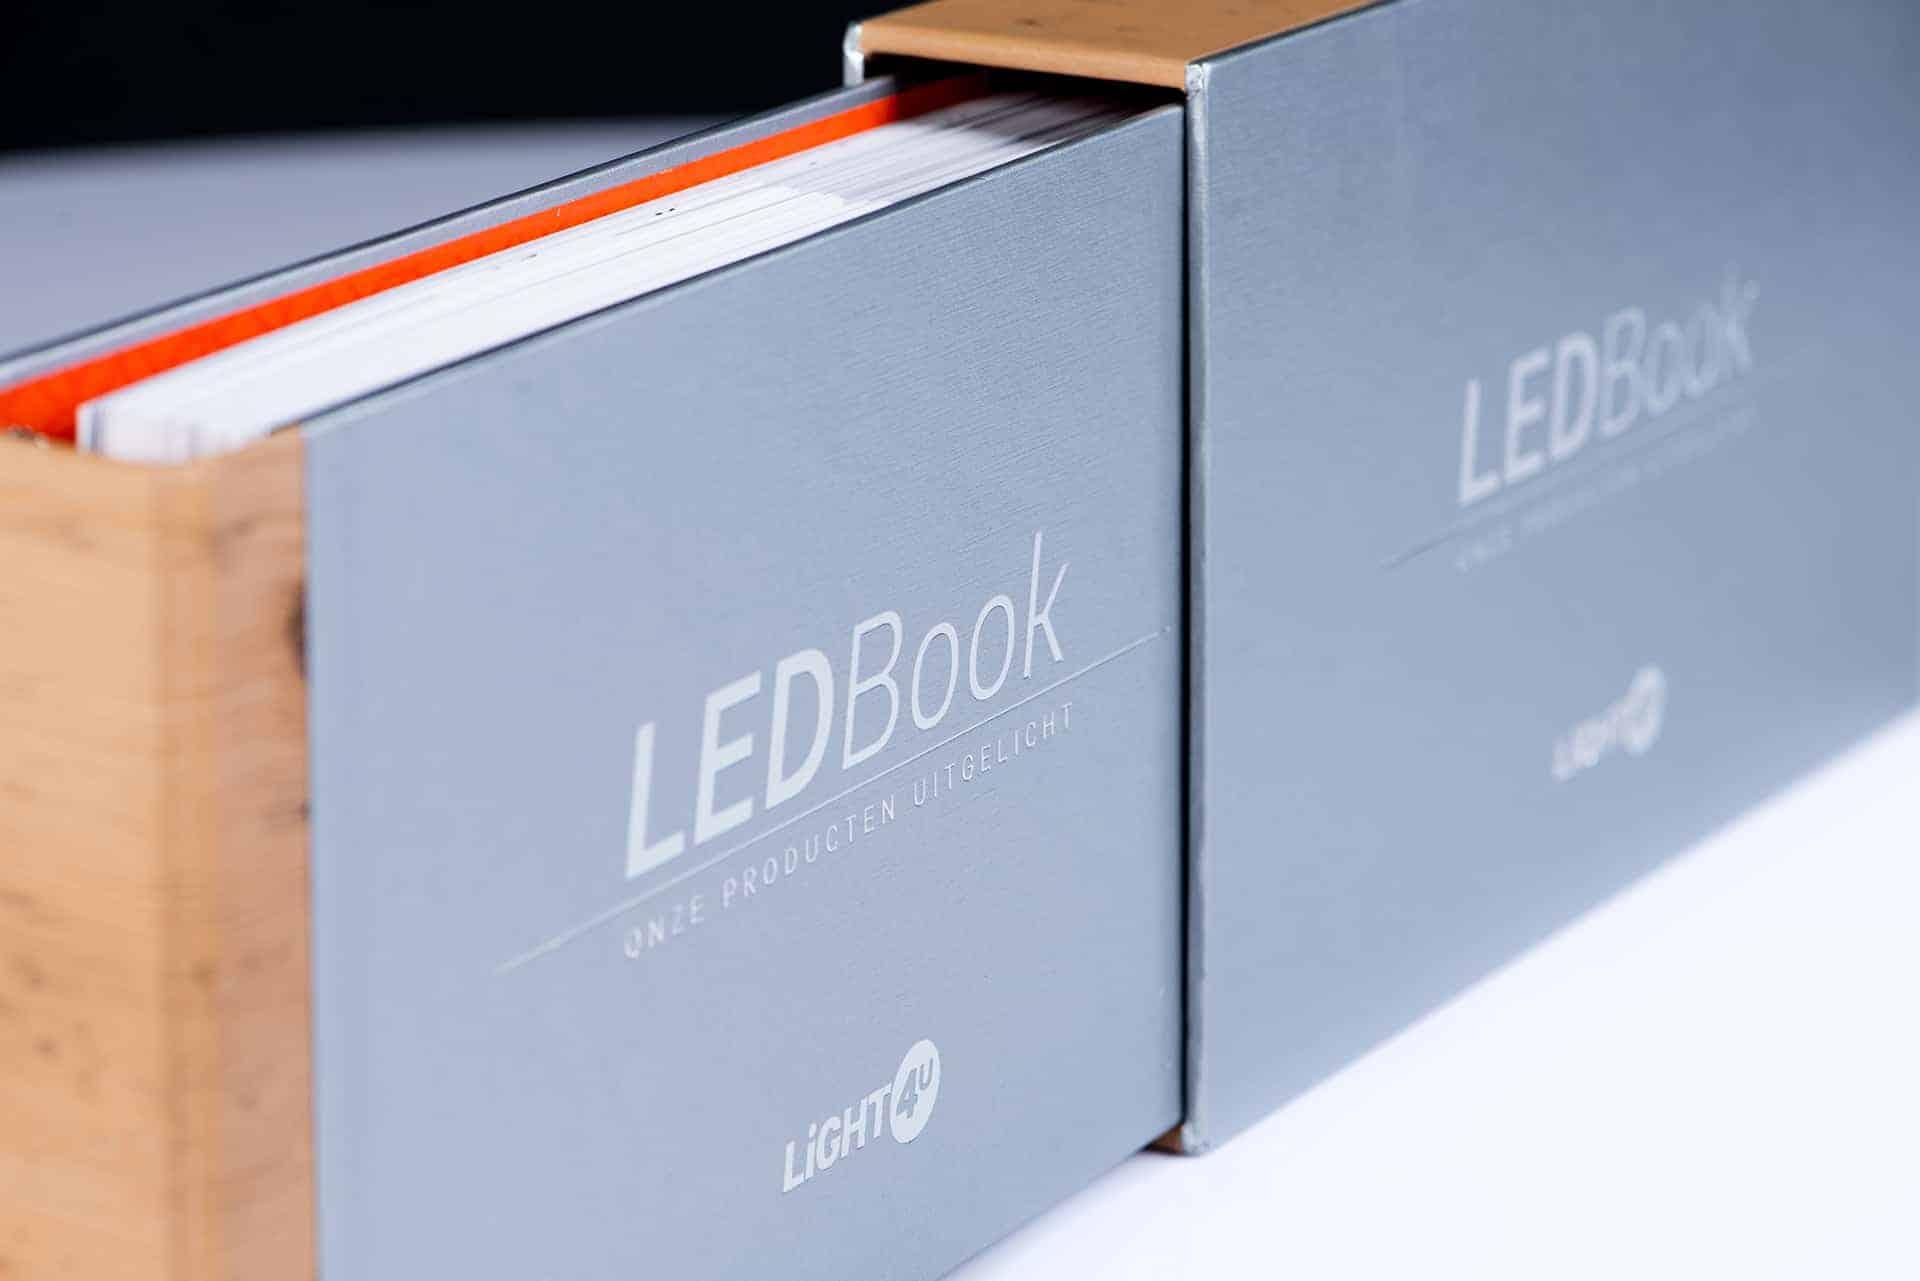 LEDBook assortiment Light4U